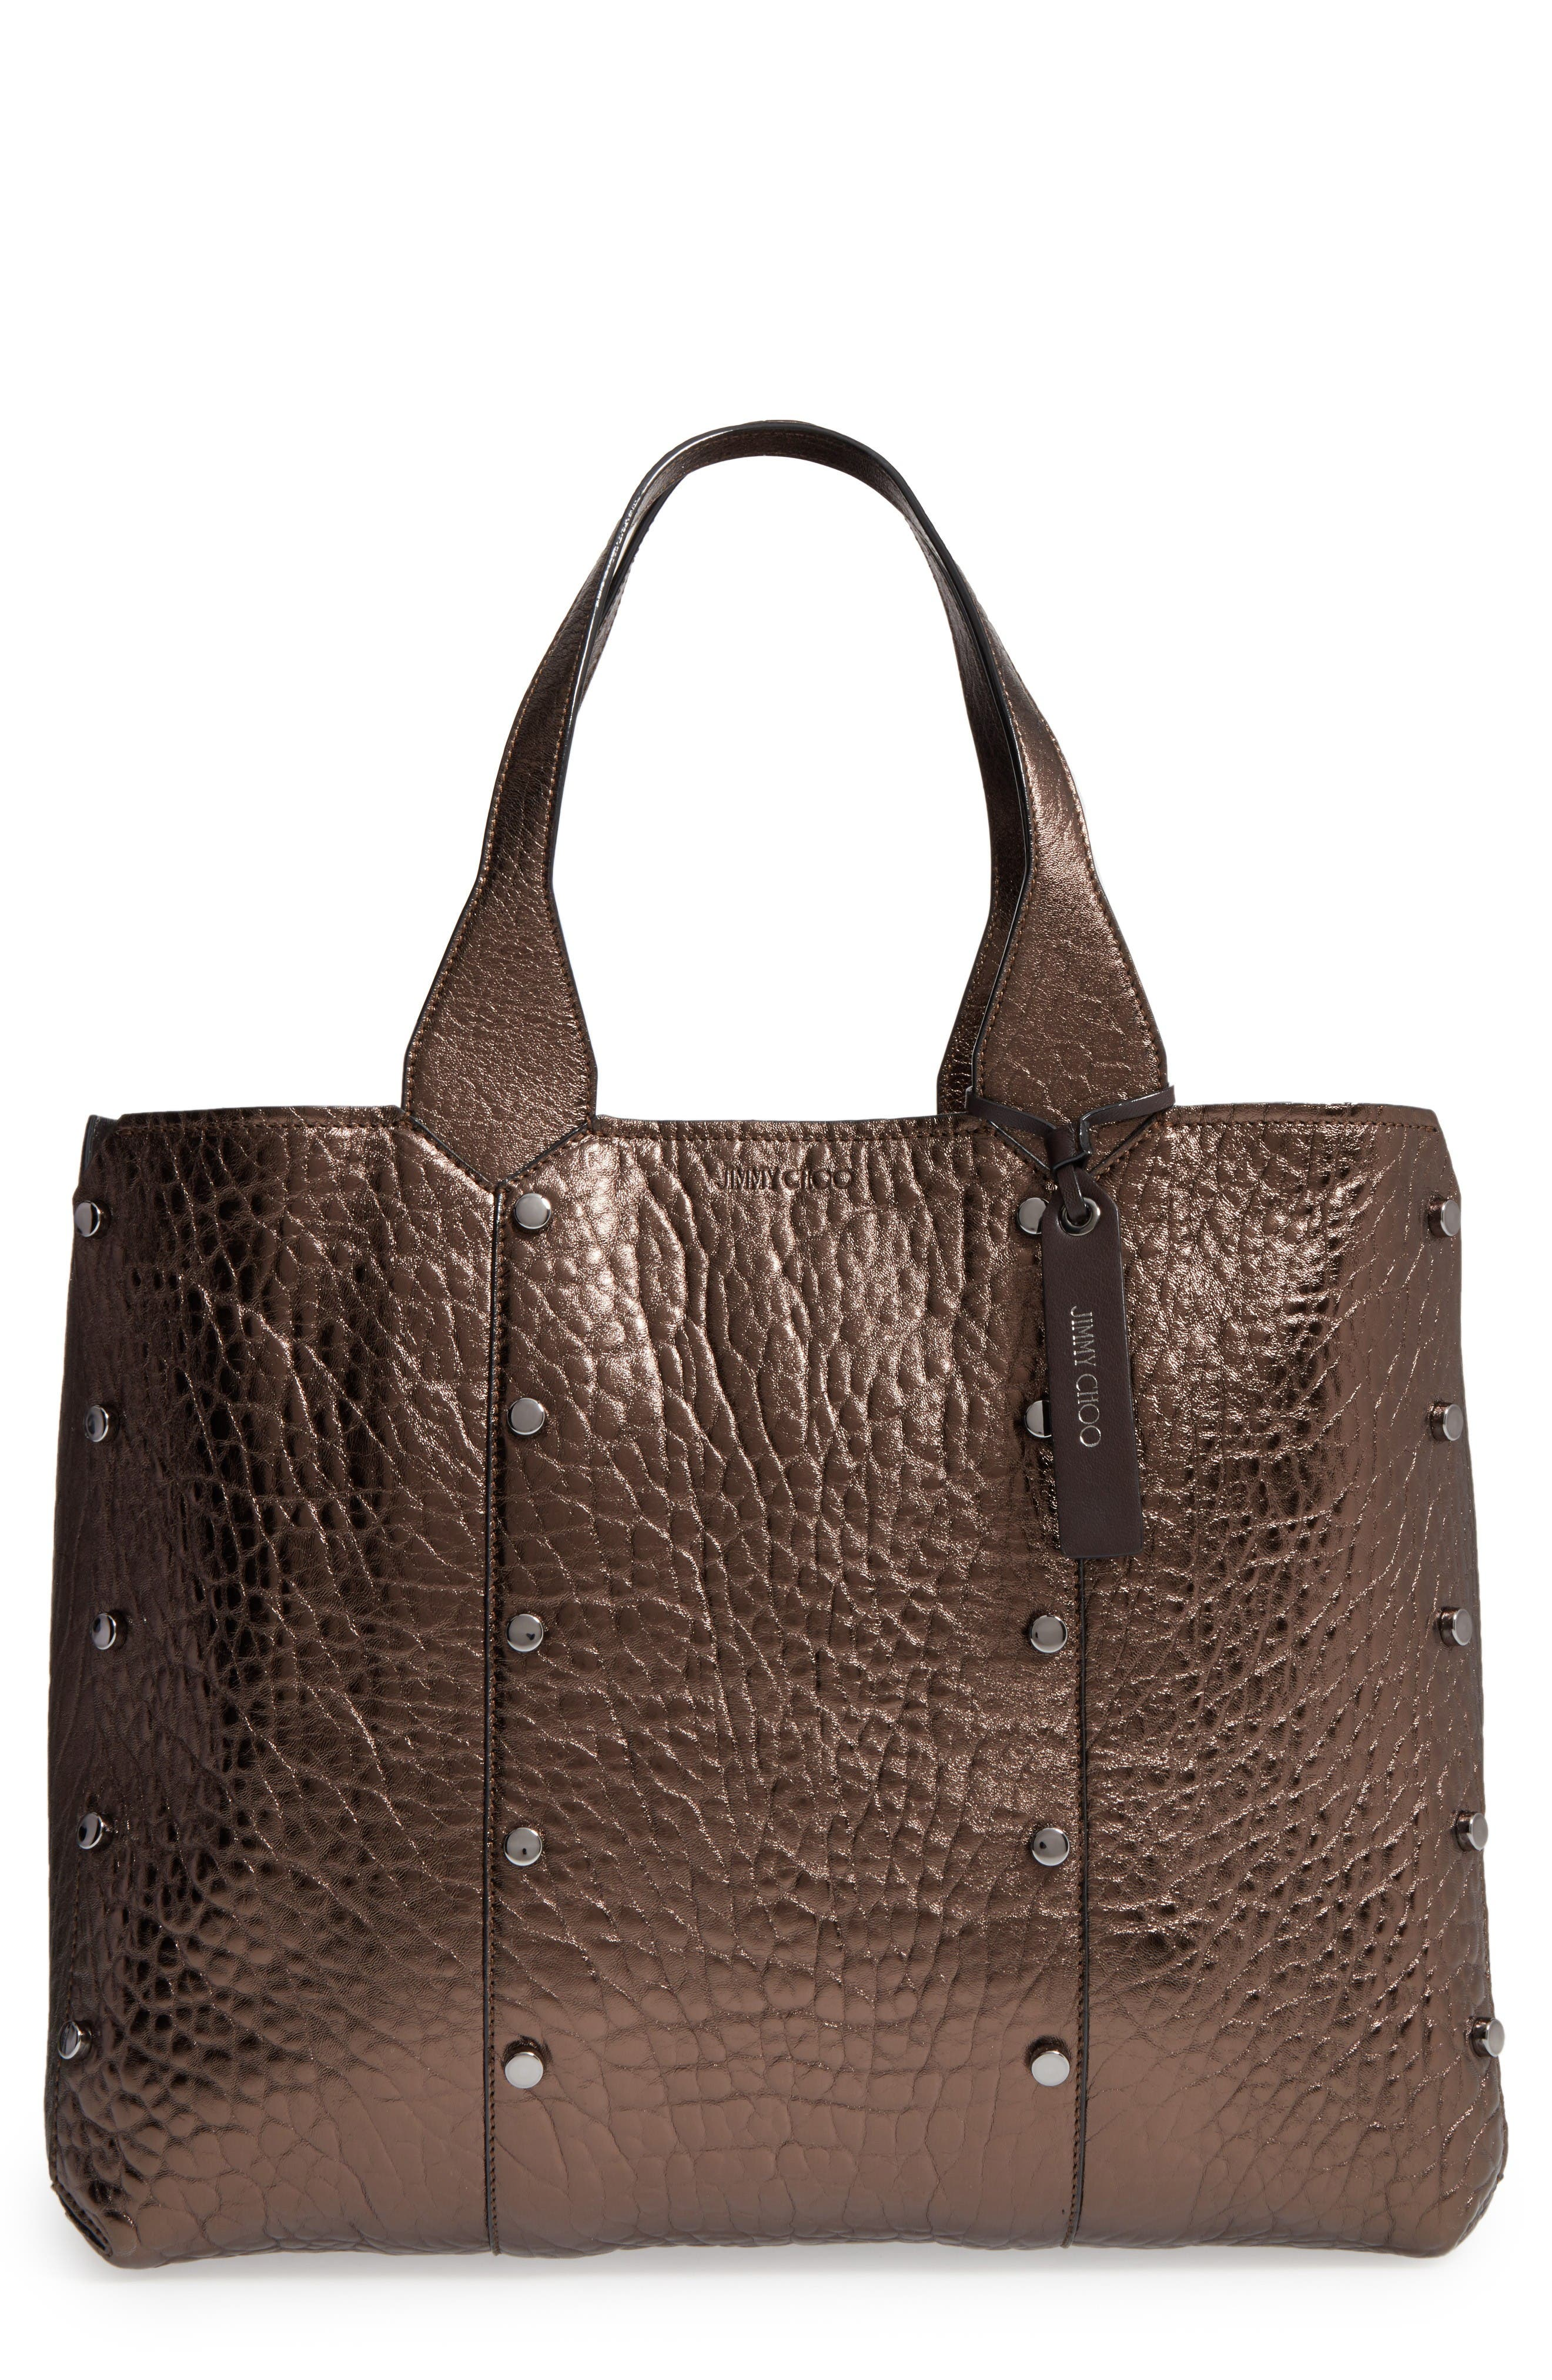 Main Image - Jimmy Choo Lockett Metallic Leather Shopper